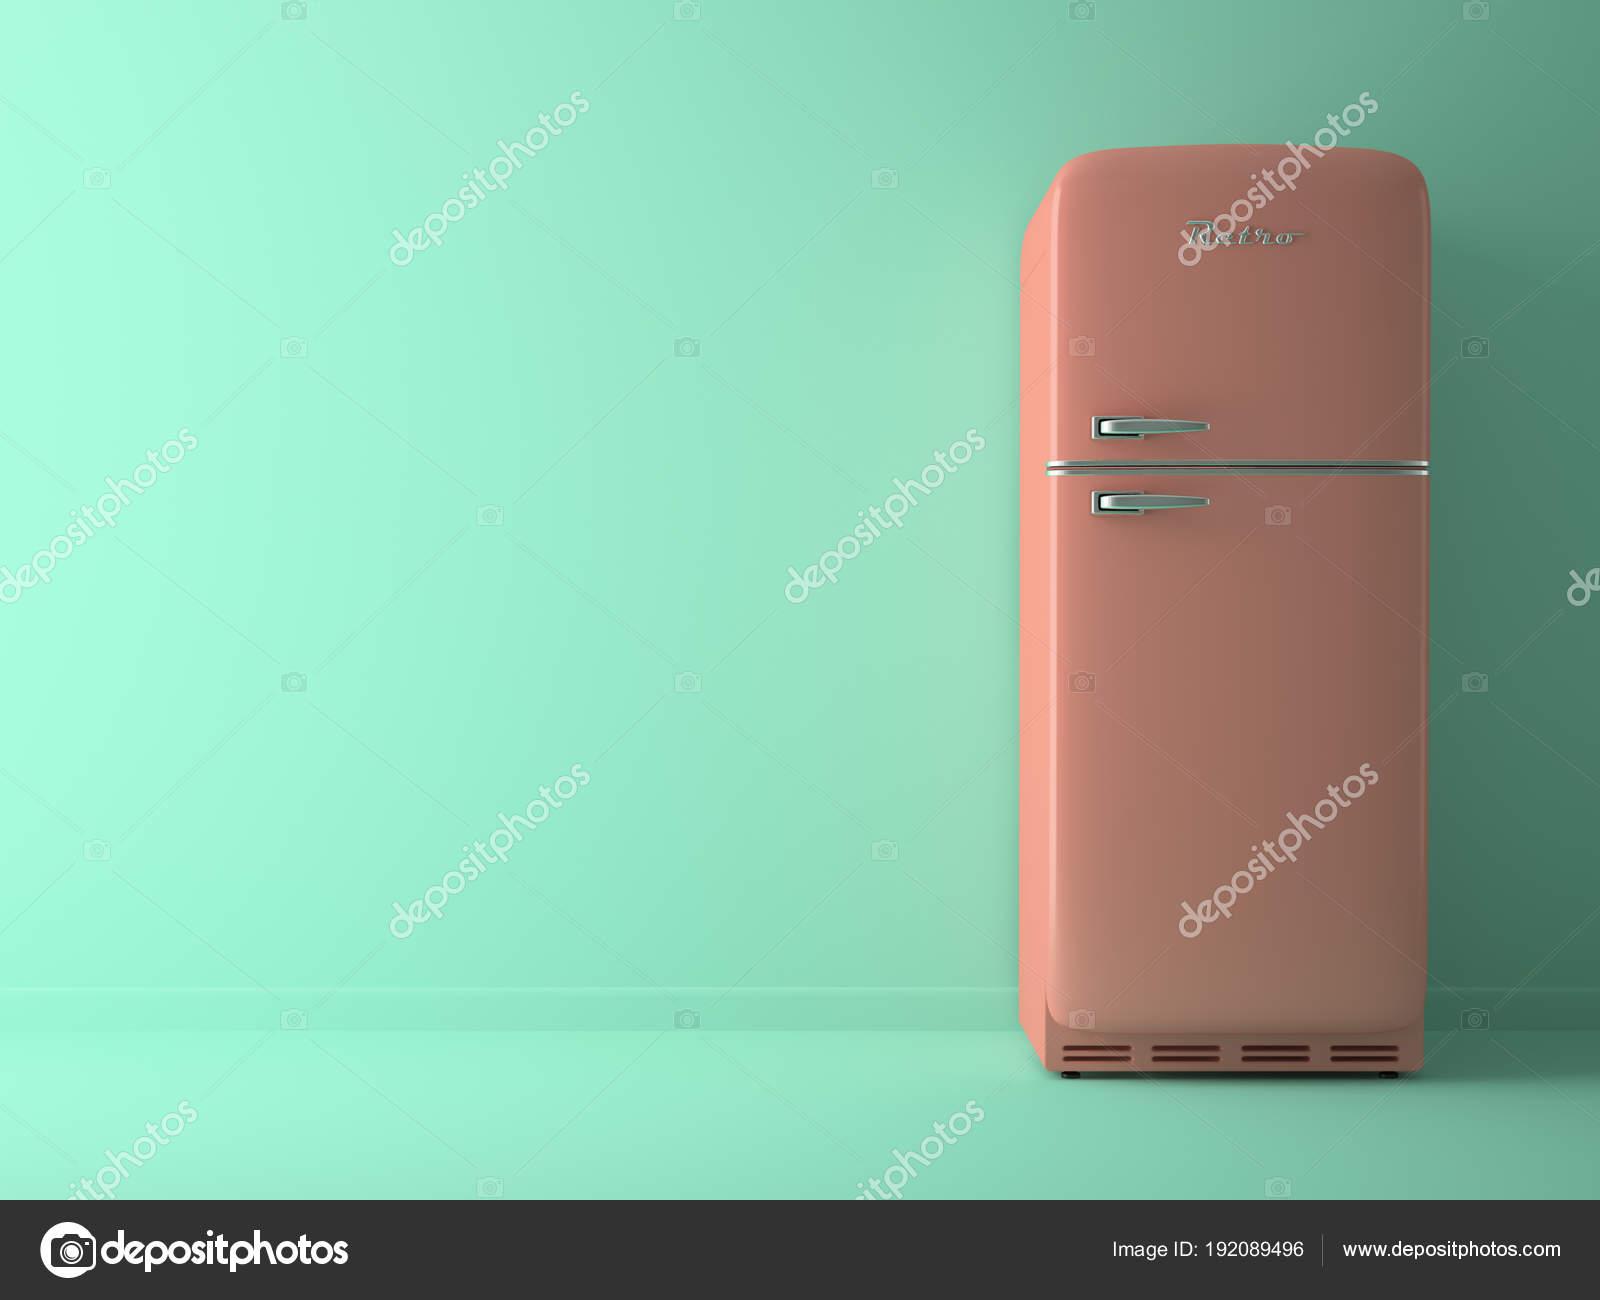 Kühlschrank Rosa : Blaue innenraum mit rosa kühlschrank d illustration u stockfoto